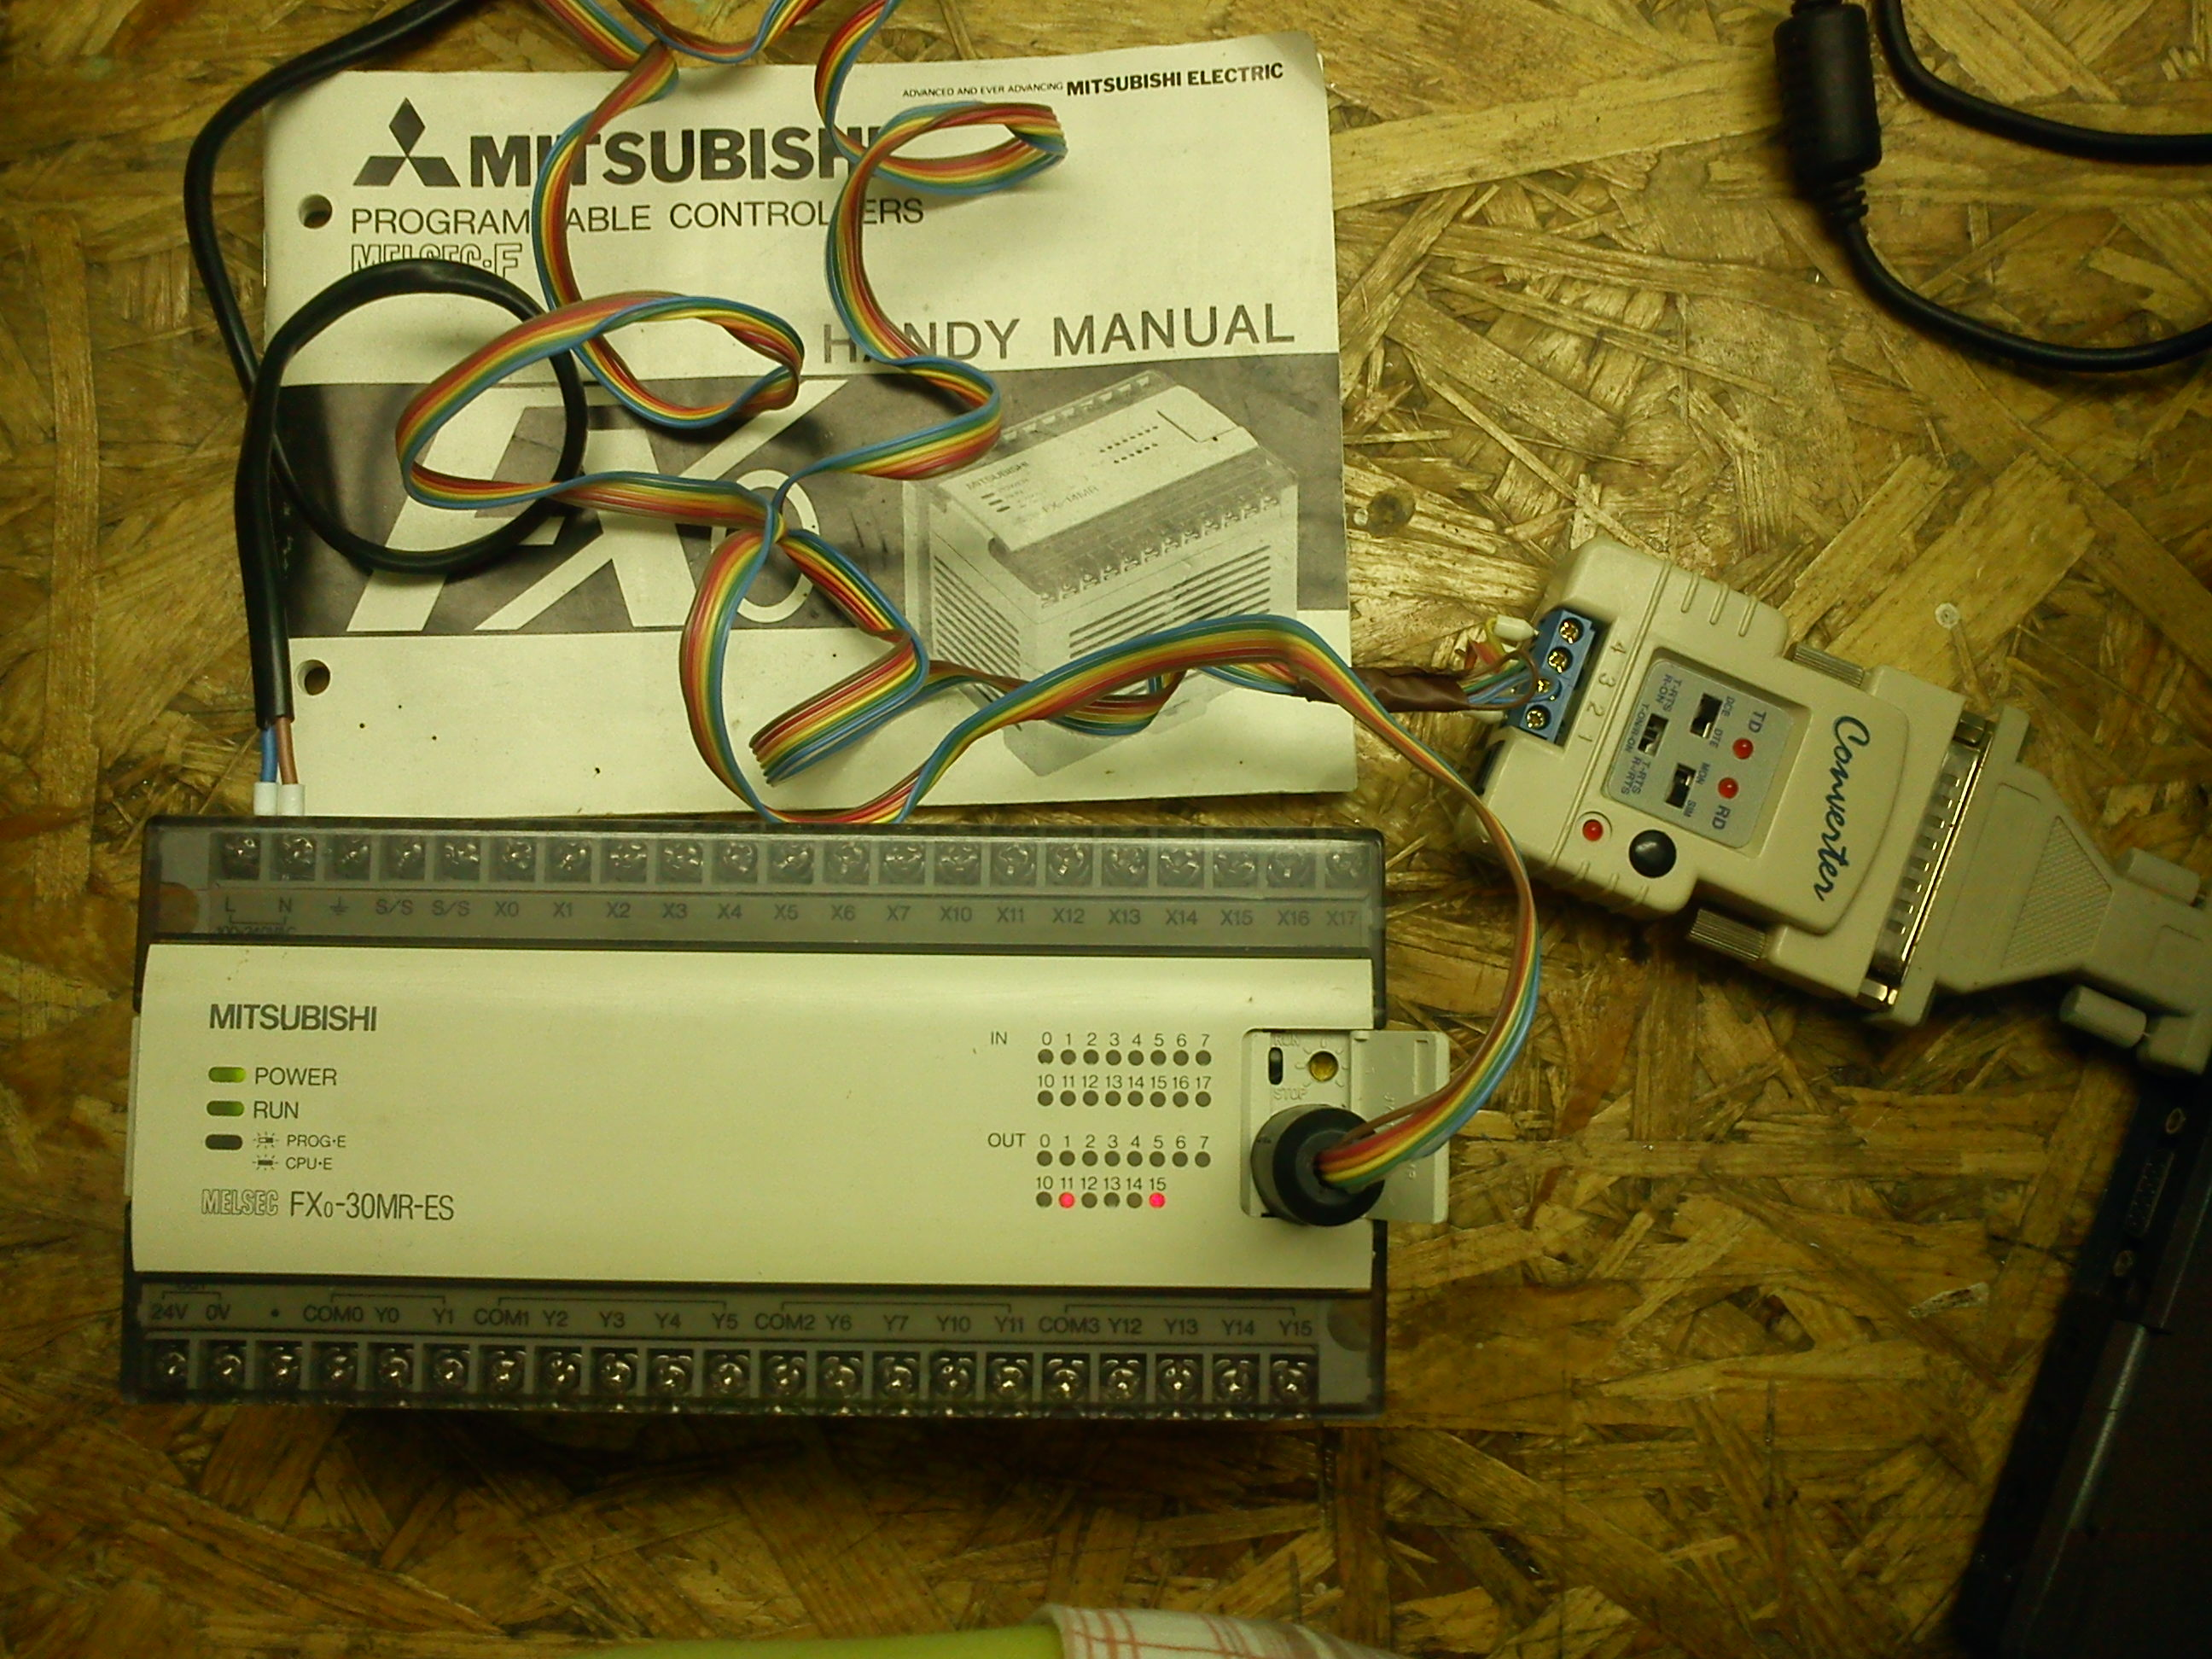 [Sprzedam] PLC MITSUBISHI FX0-30MR-ES